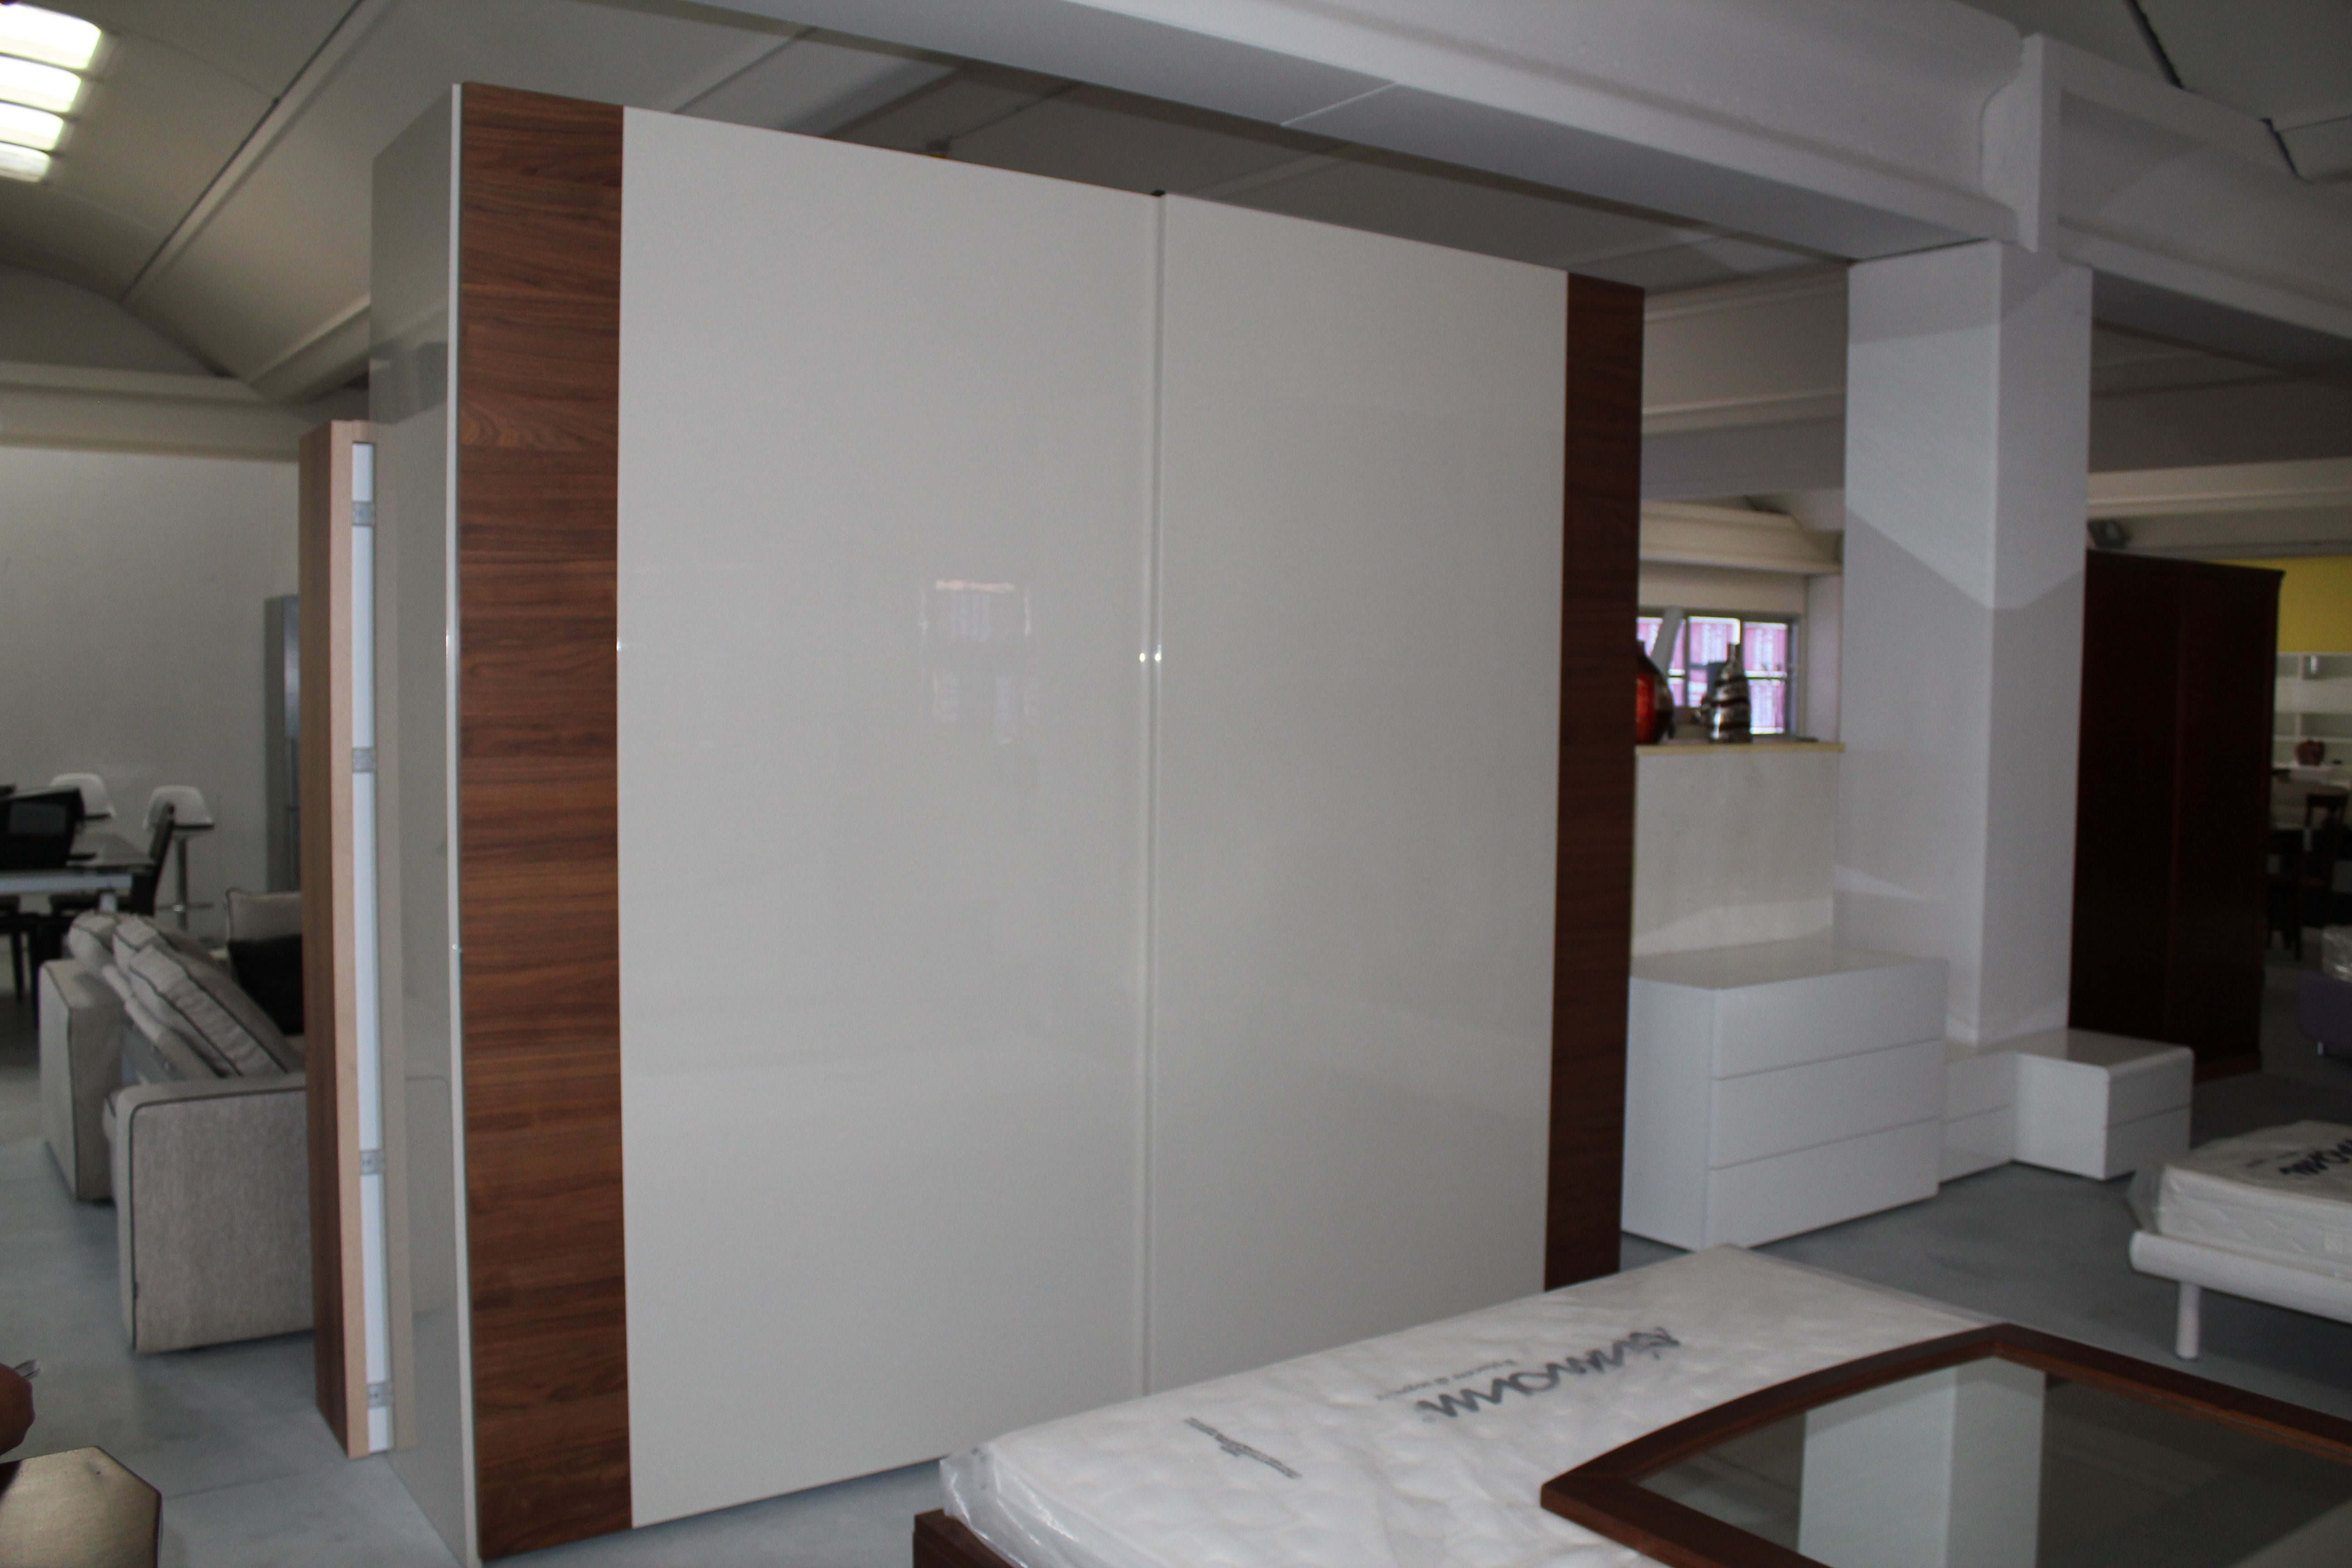 http://www.darredofranzese.com/products-page/la-notte ...